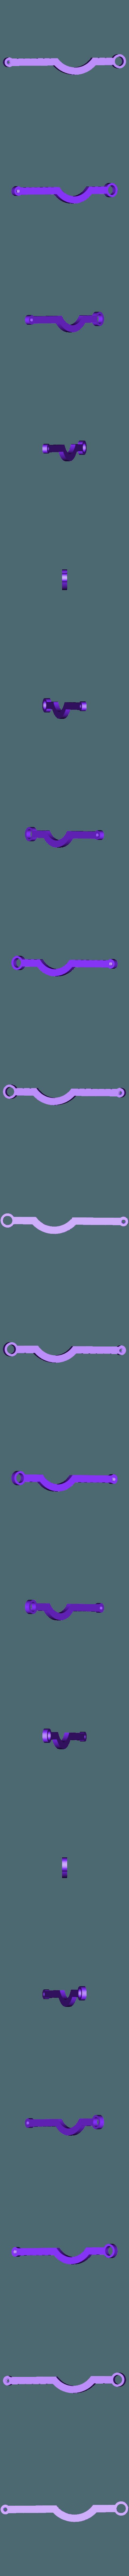 Arm_CD.stl Download free STL file Marblevator, Mechanisms • Object to 3D print, gzumwalt